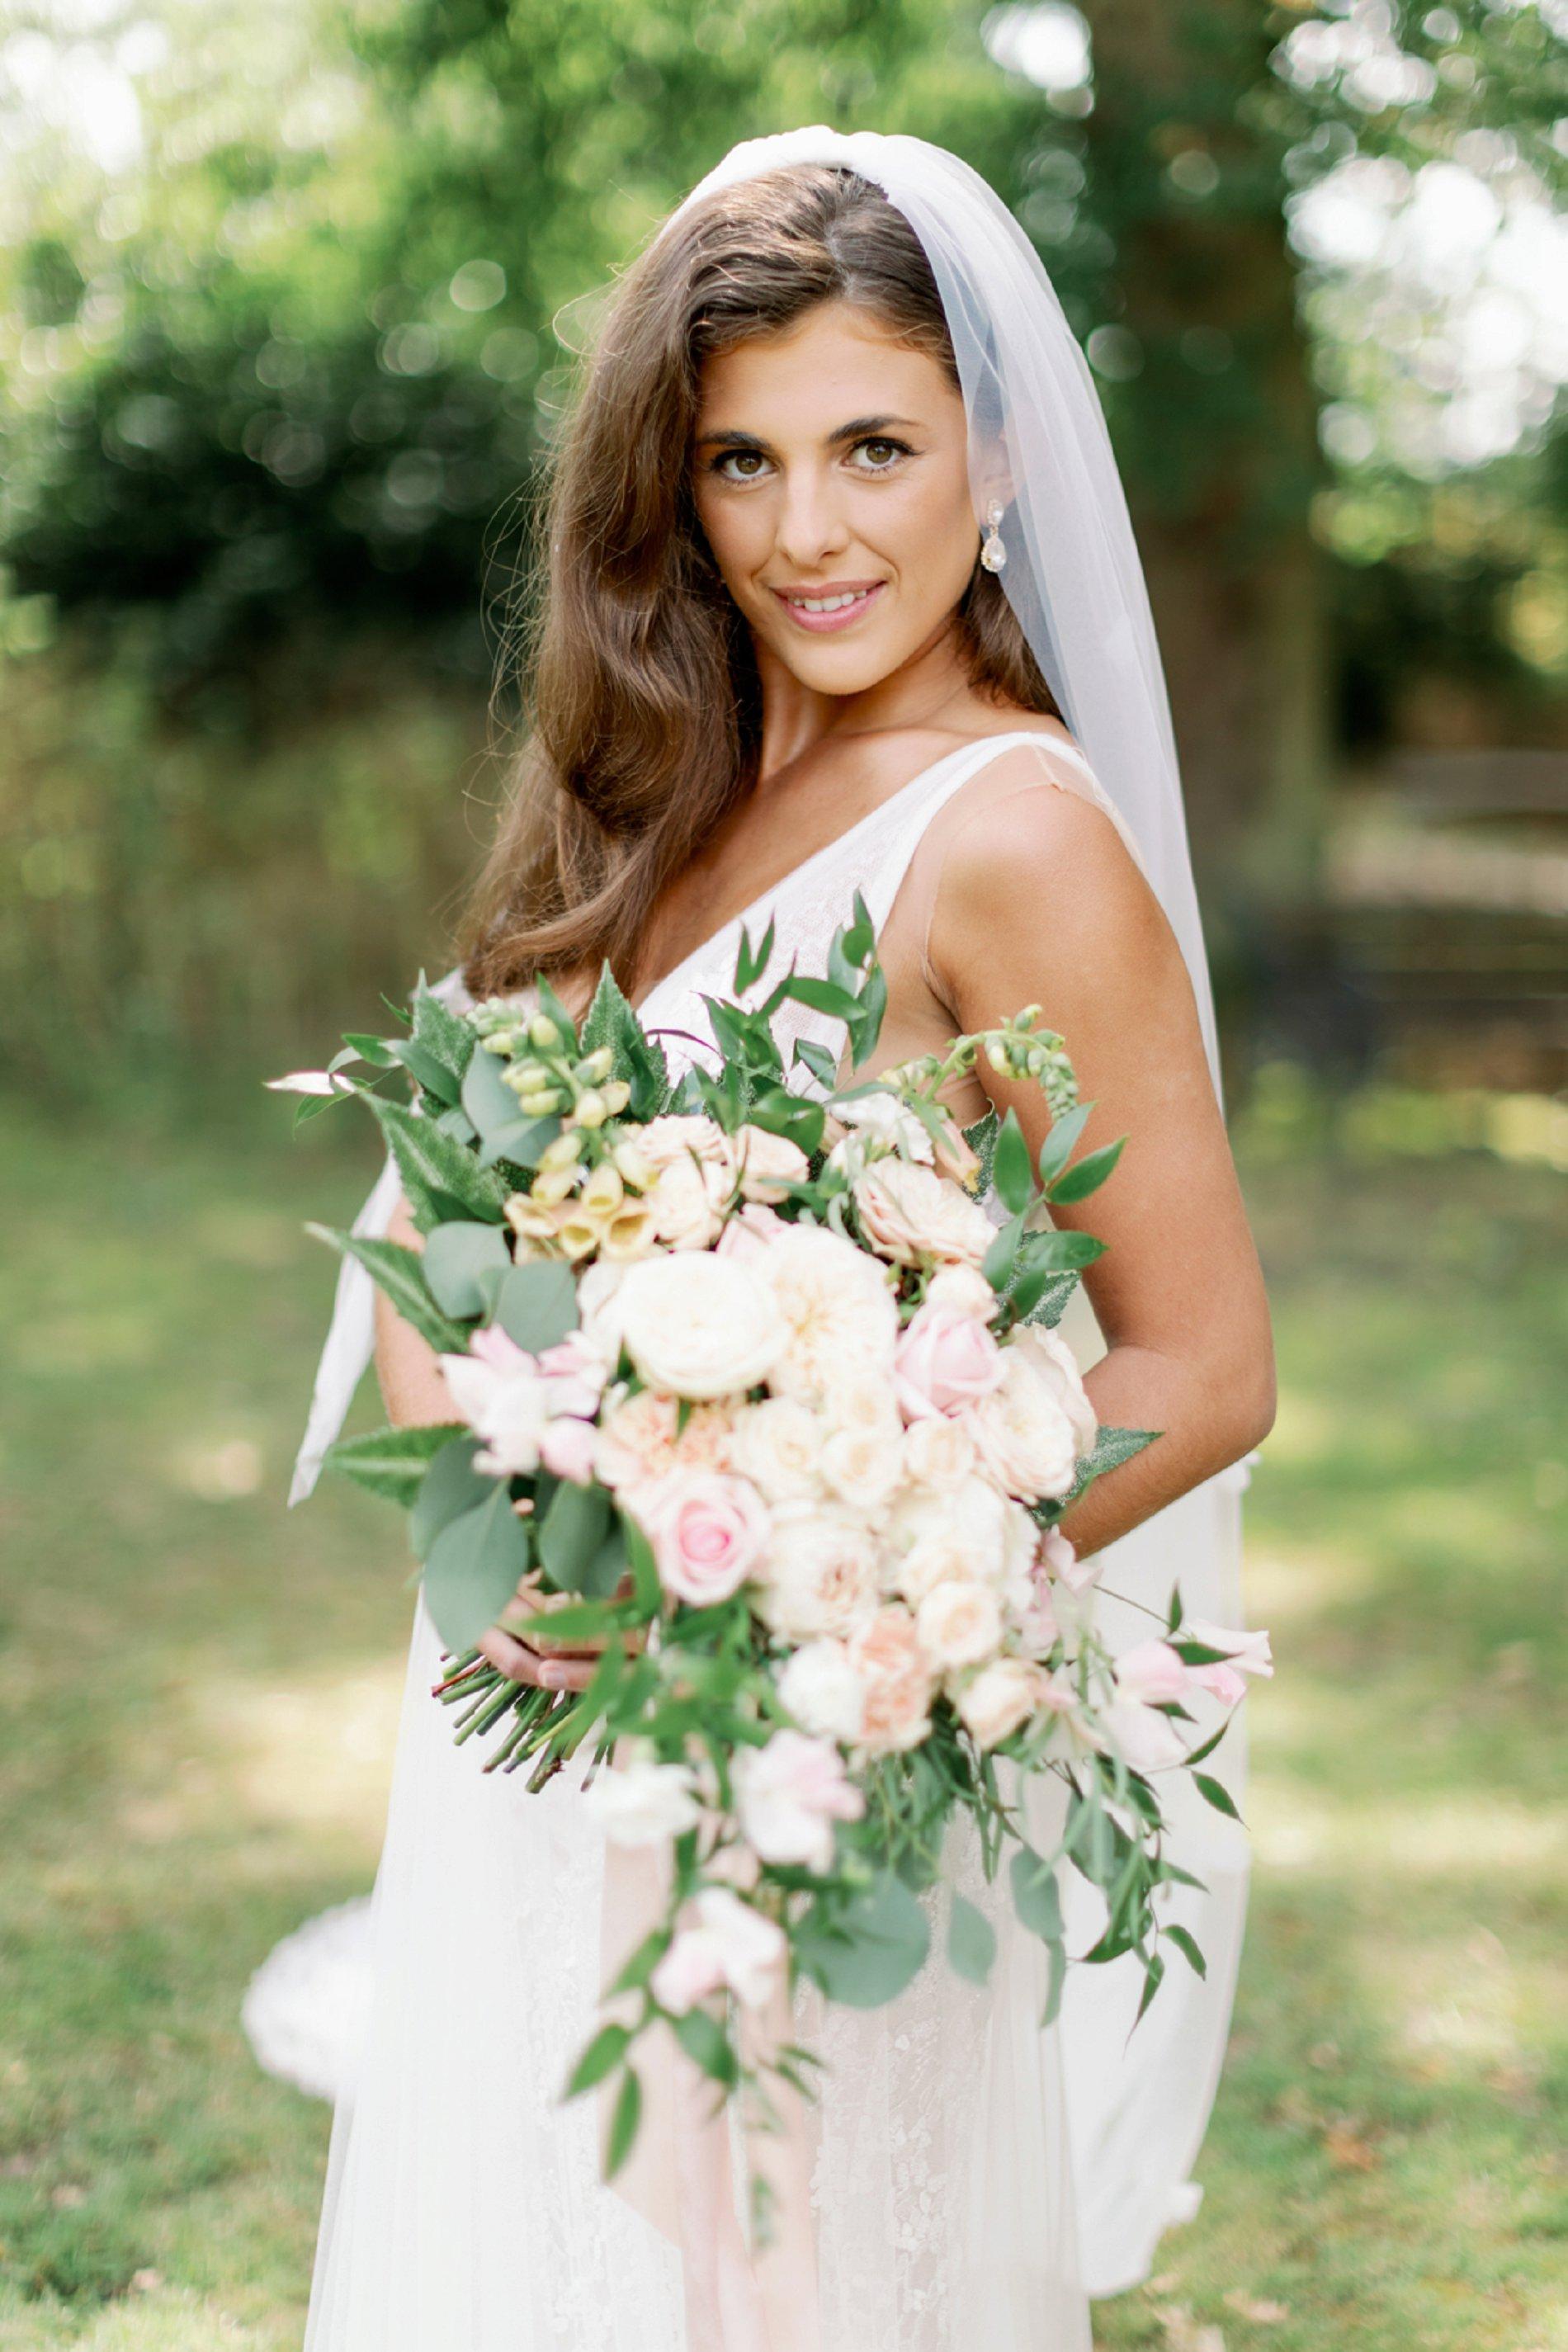 An Elegant Styled Shoot at Baddow Park House (c) Camilla J Hards (23)